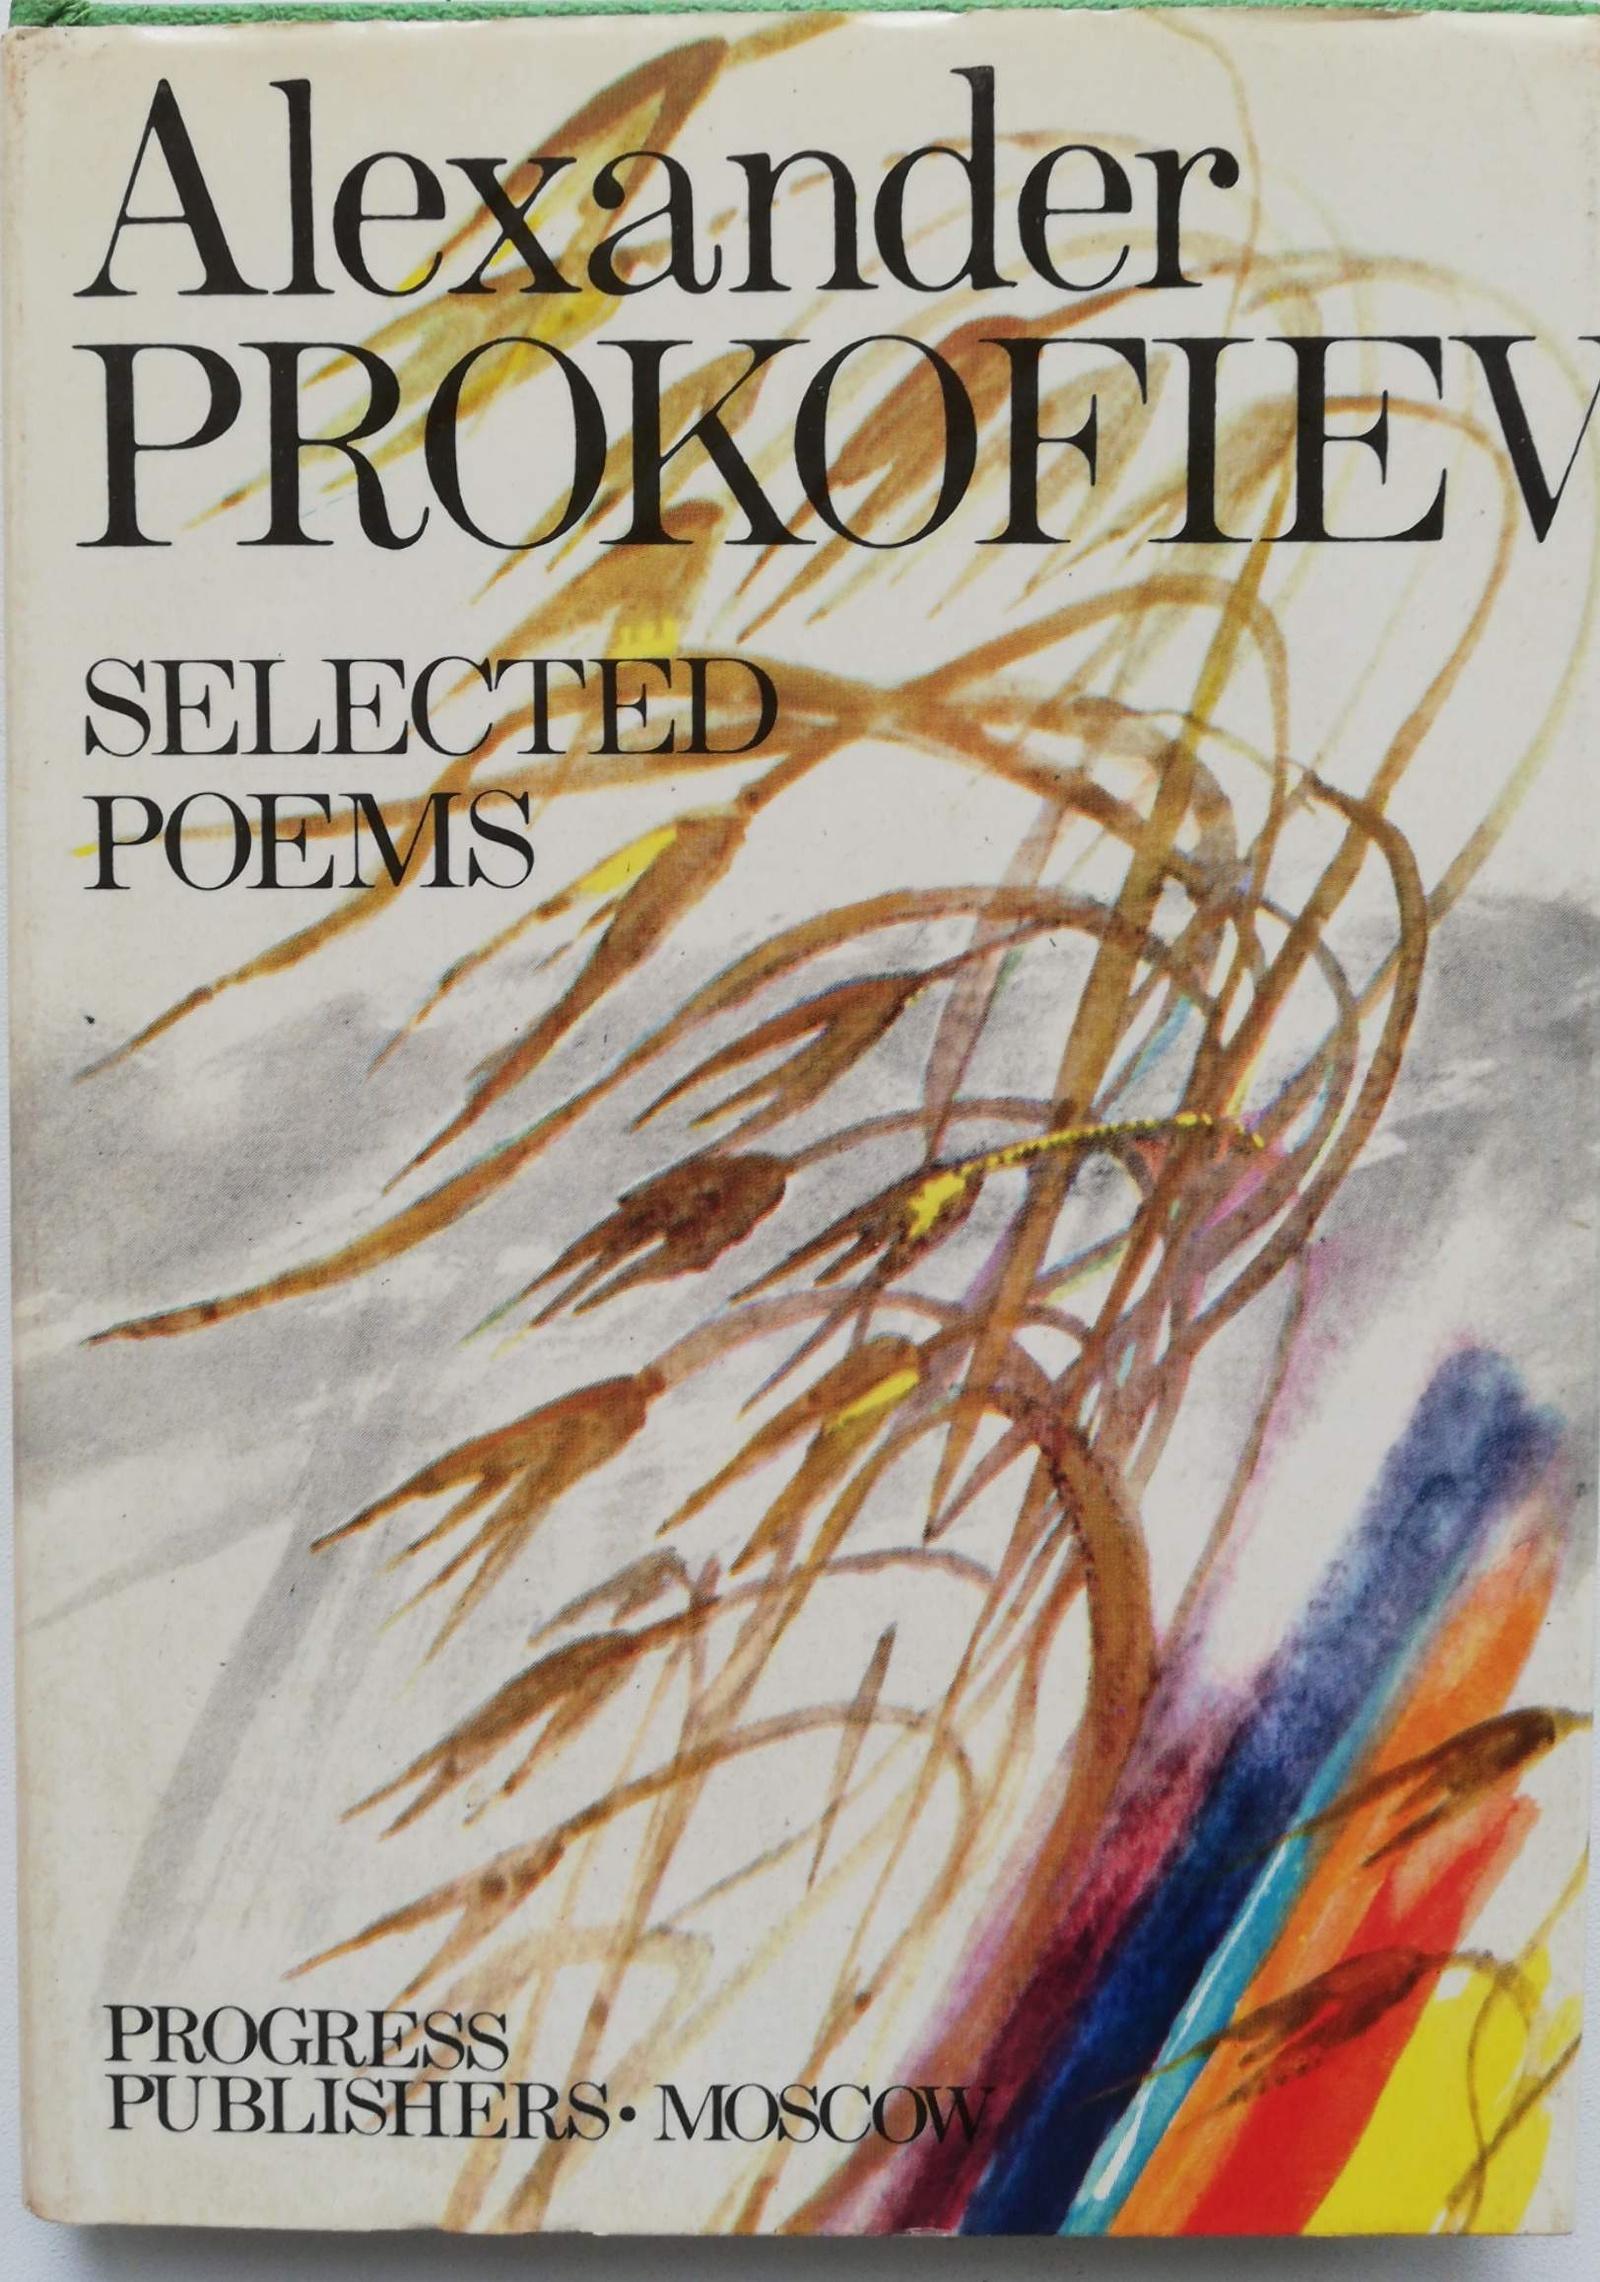 Alexander Prokofiev Alexander Prokofiev: Selected Poems дженин дженсен janine jansen prokofiev